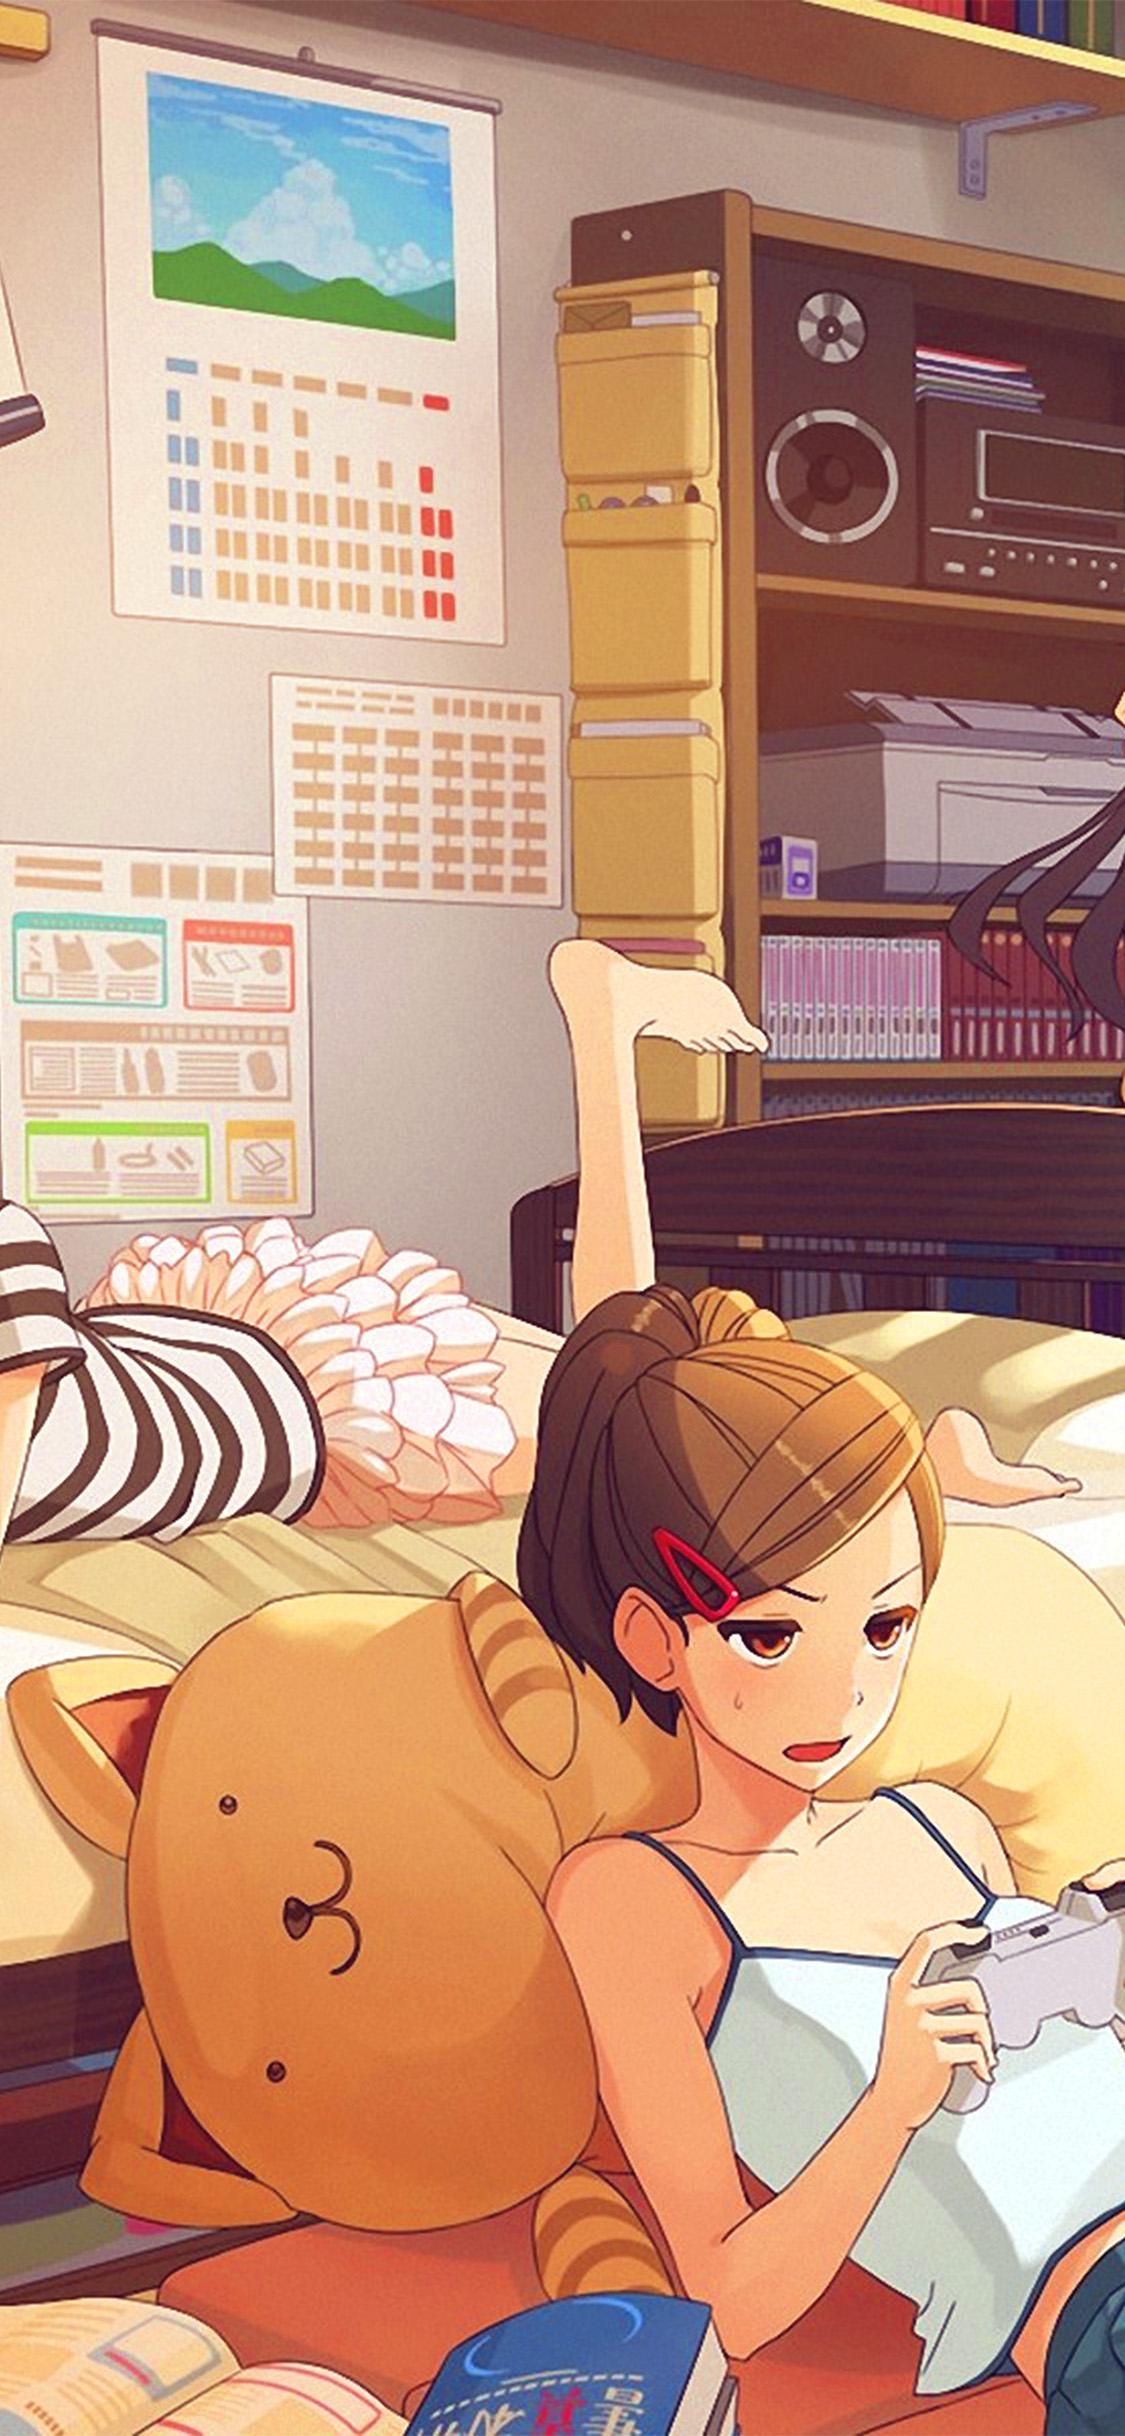 iPhonexpapers.com-Apple-iPhone-wallpaper-bc45-girl-room-anime-art-illustration-cute